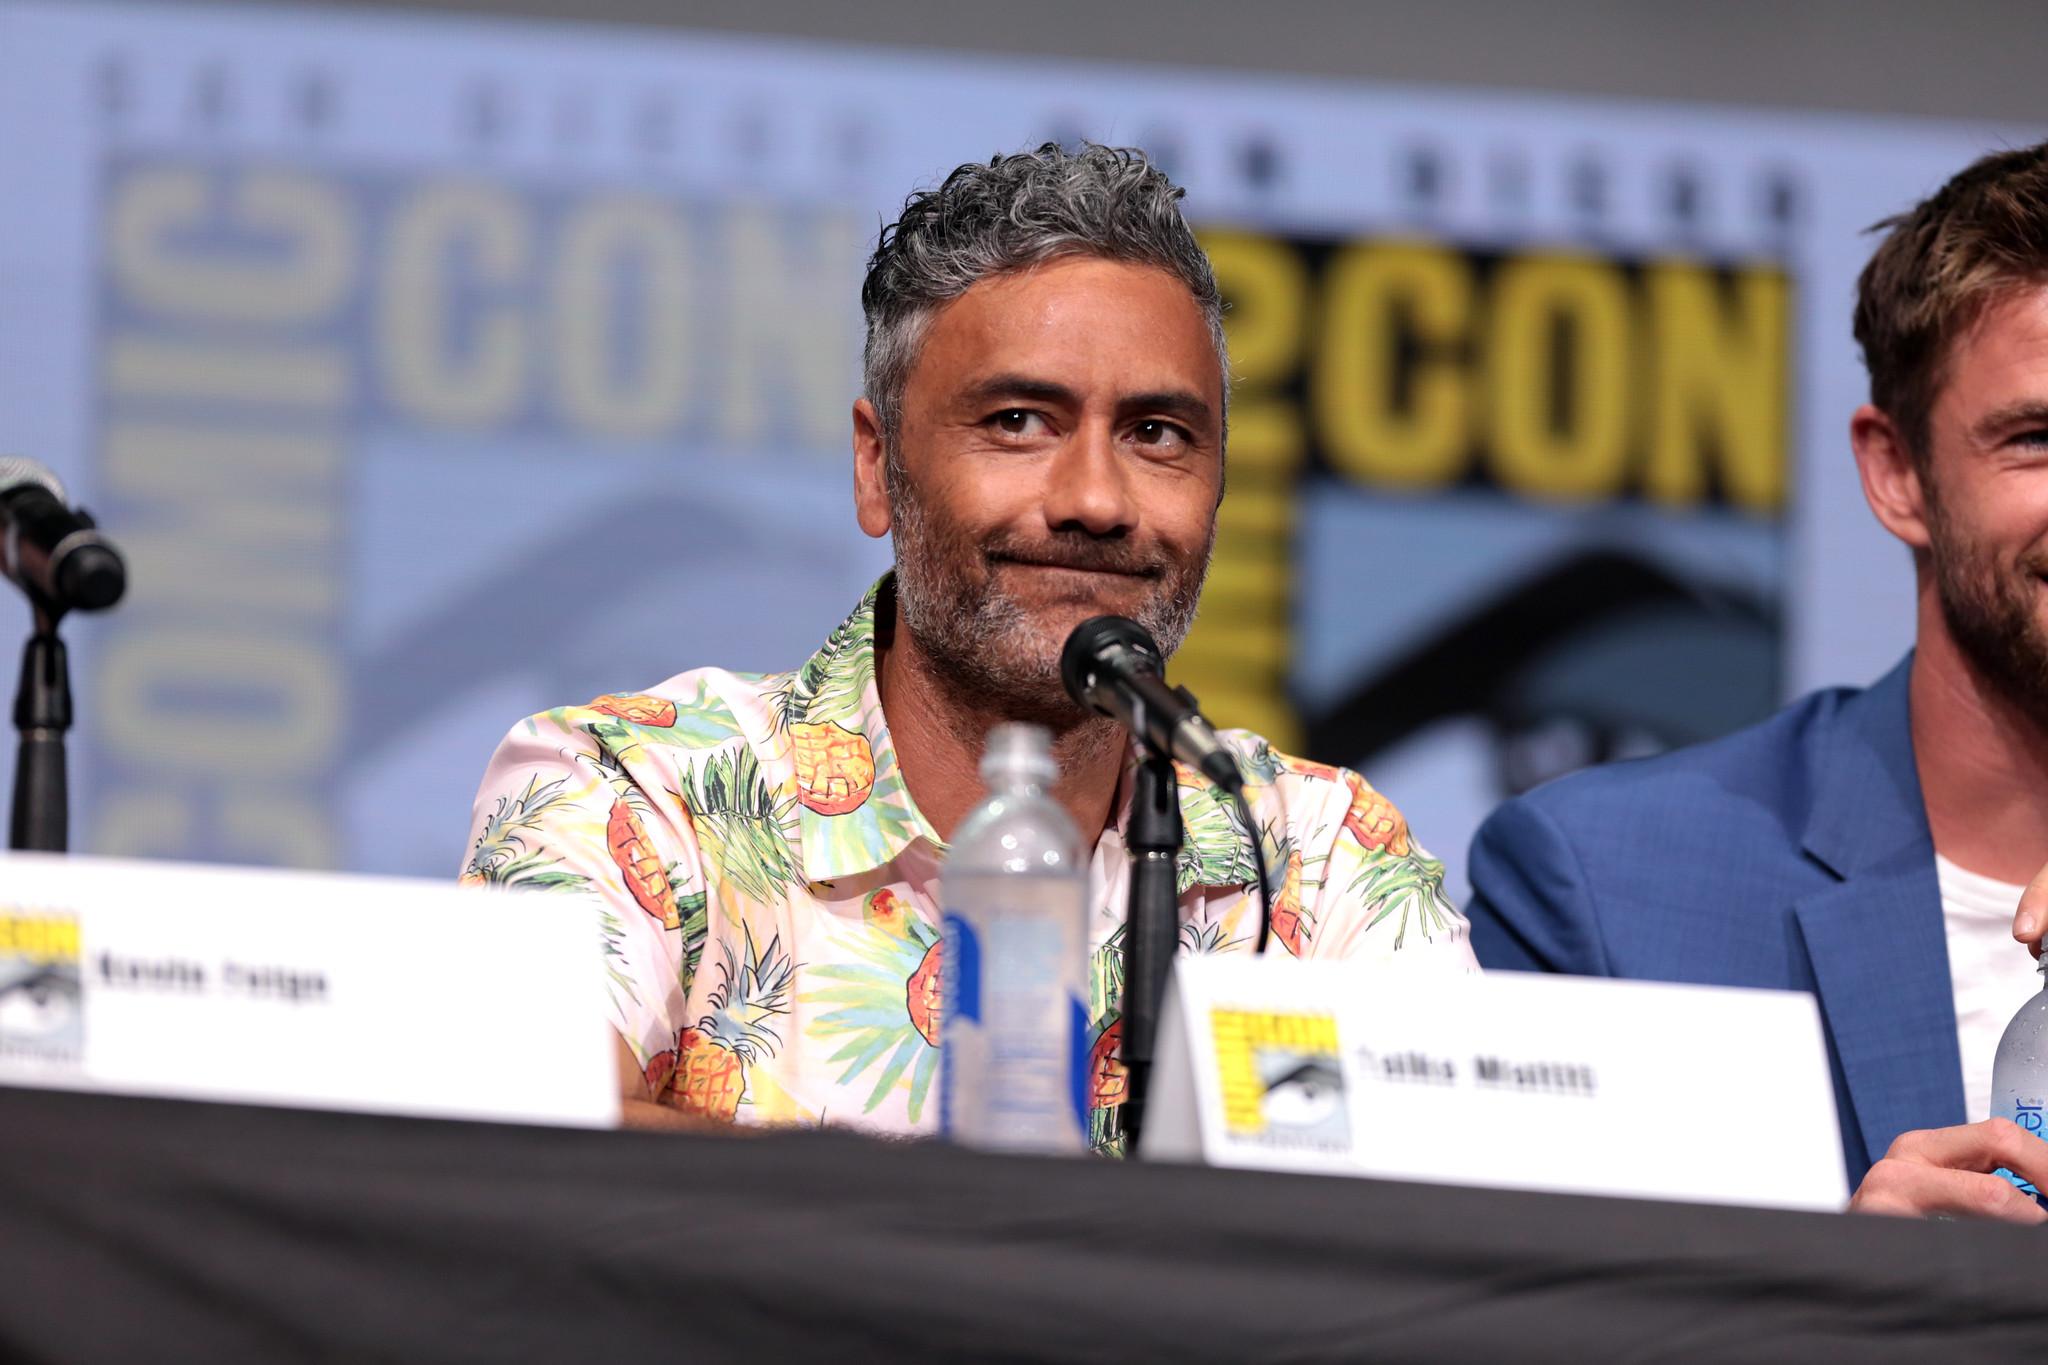 Taiki Waititi at Comic Con